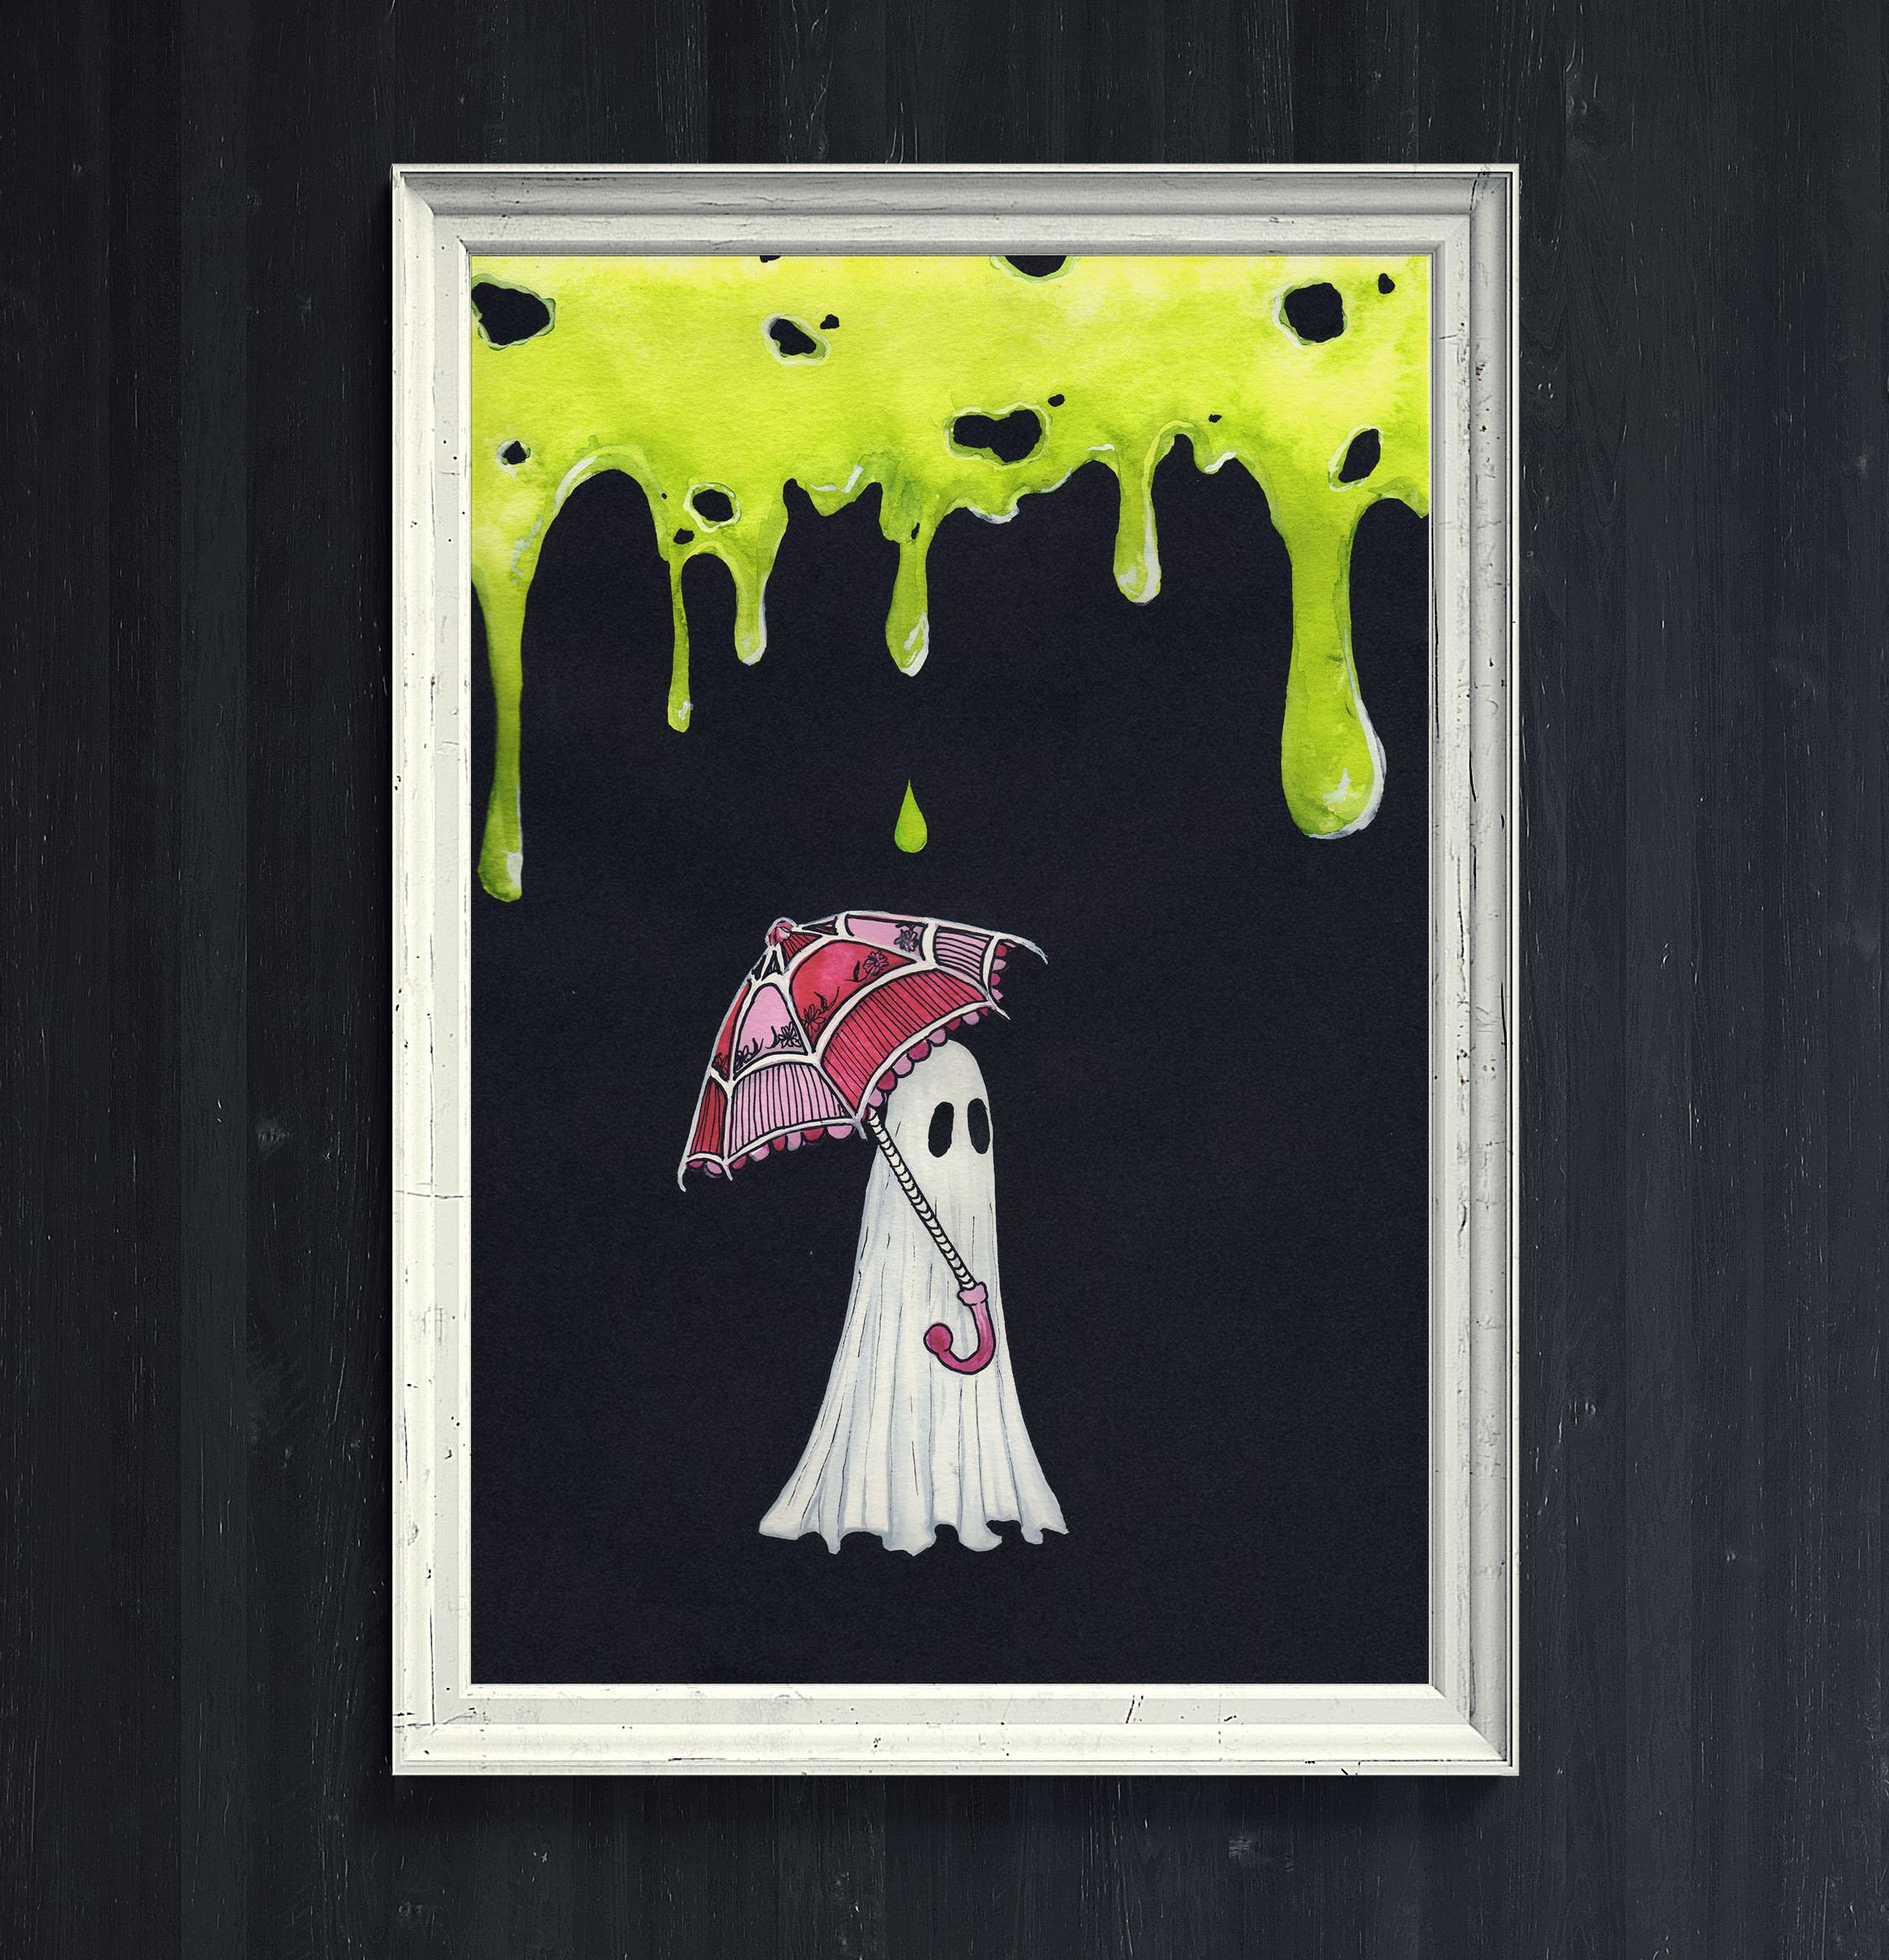 ghostslimeiiframe